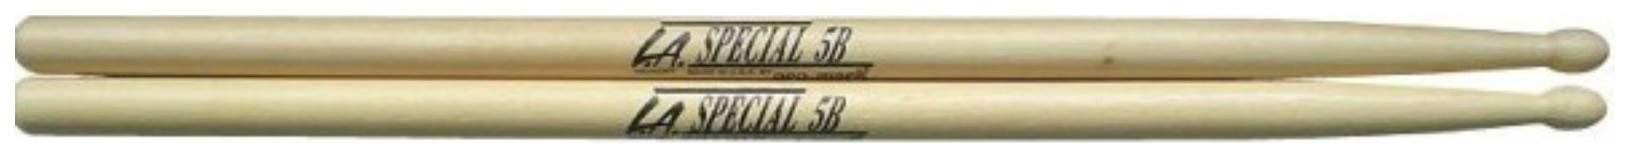 Барабанные палочки орех PRO MARK LA5BW